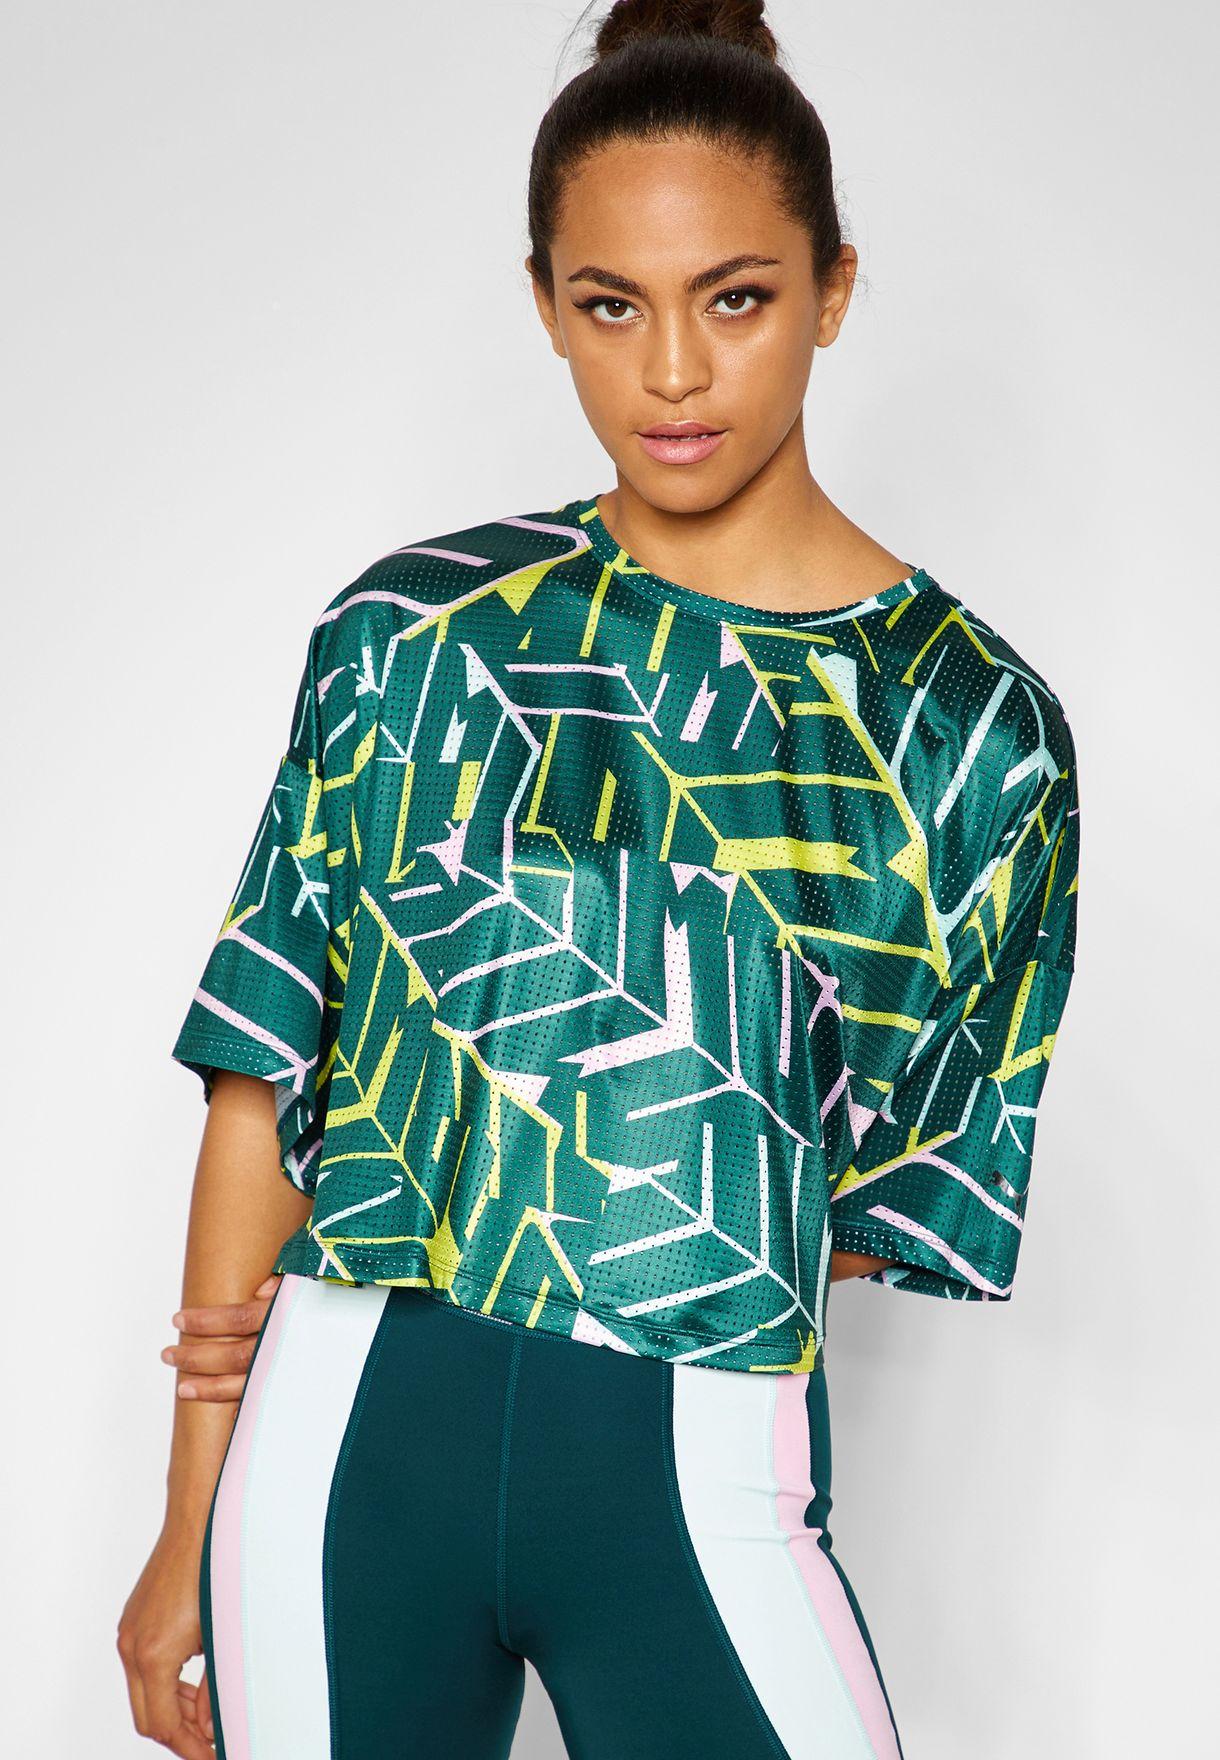 10b74e91b632 Shop PUMA prints Trailblazer Cosmic T-Shirt 51737703 for Women in ...